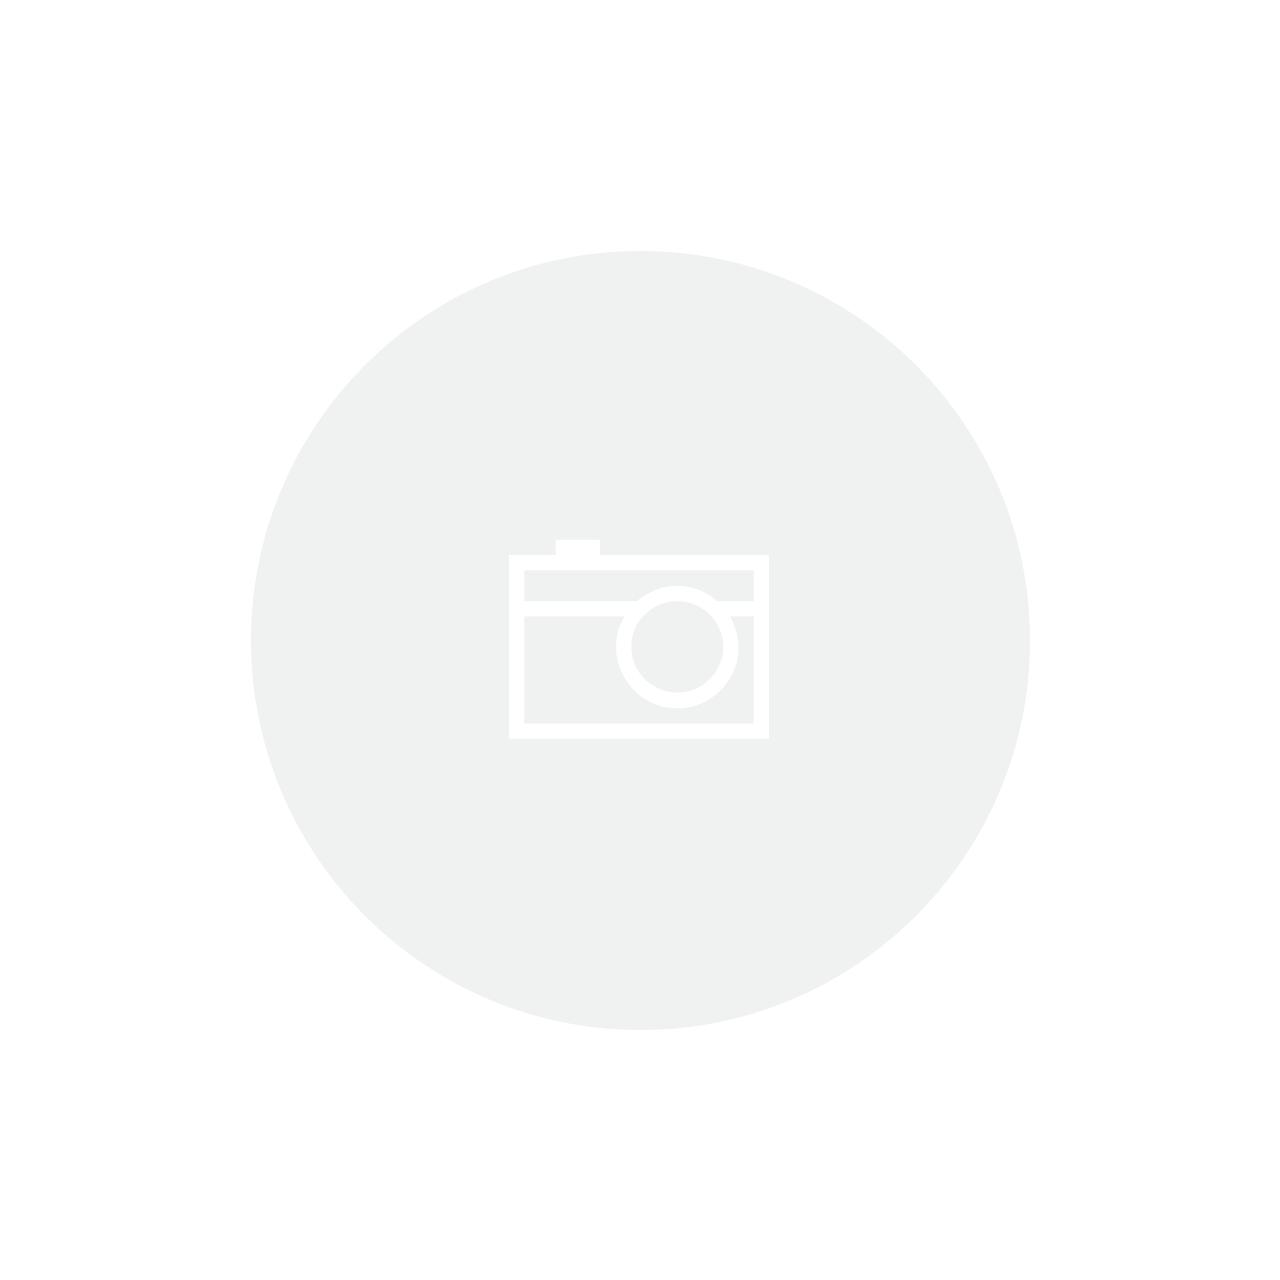 Casaco Pele Fox Marrom Longo 031if18